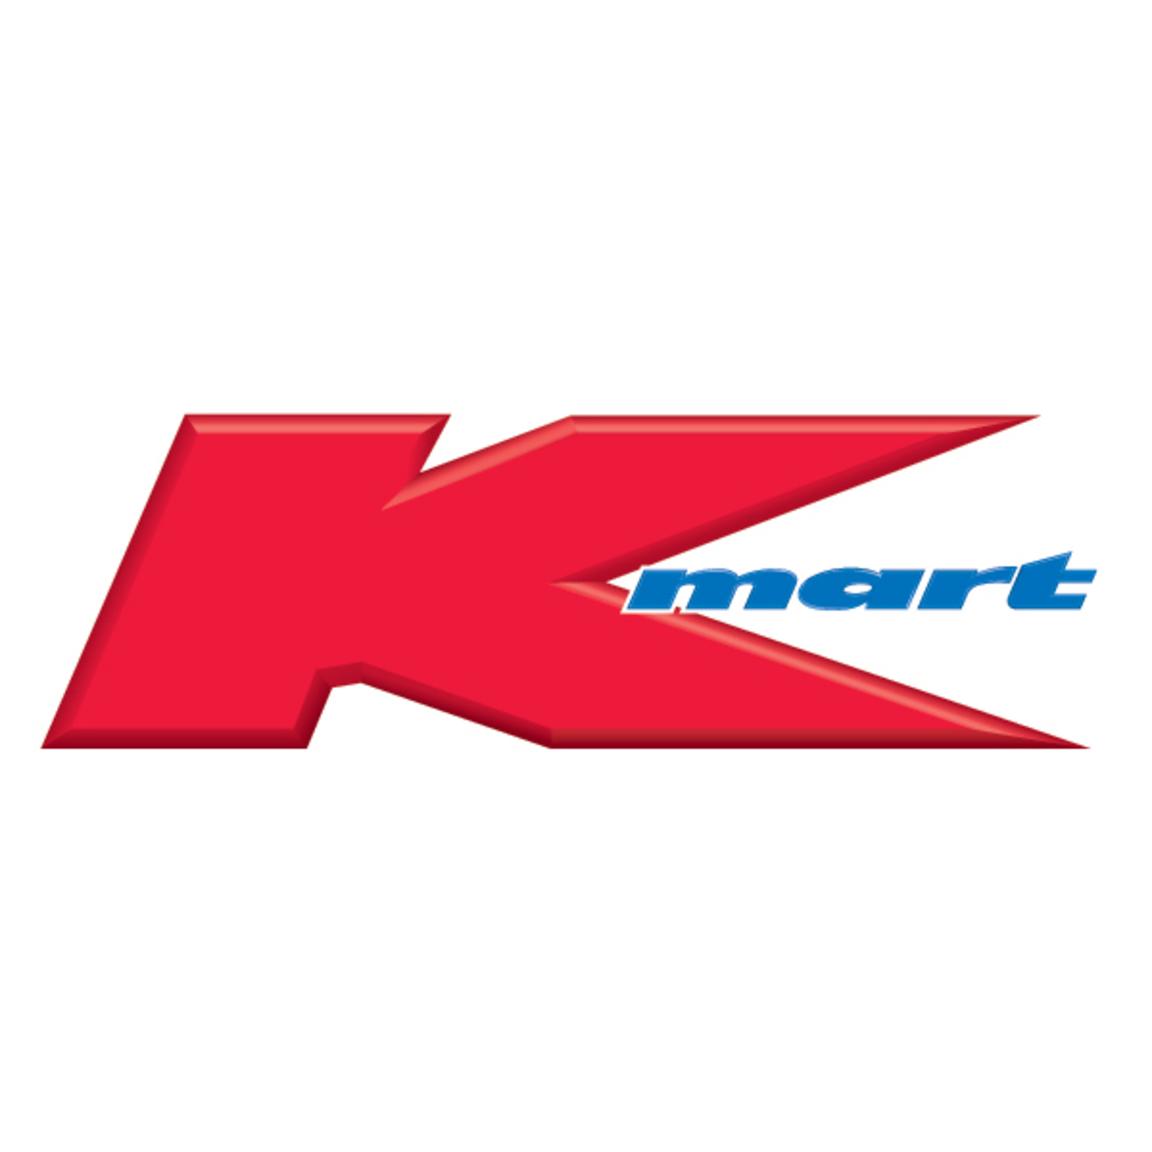 Kmart at westfield carousel bookmarktalkfo Images